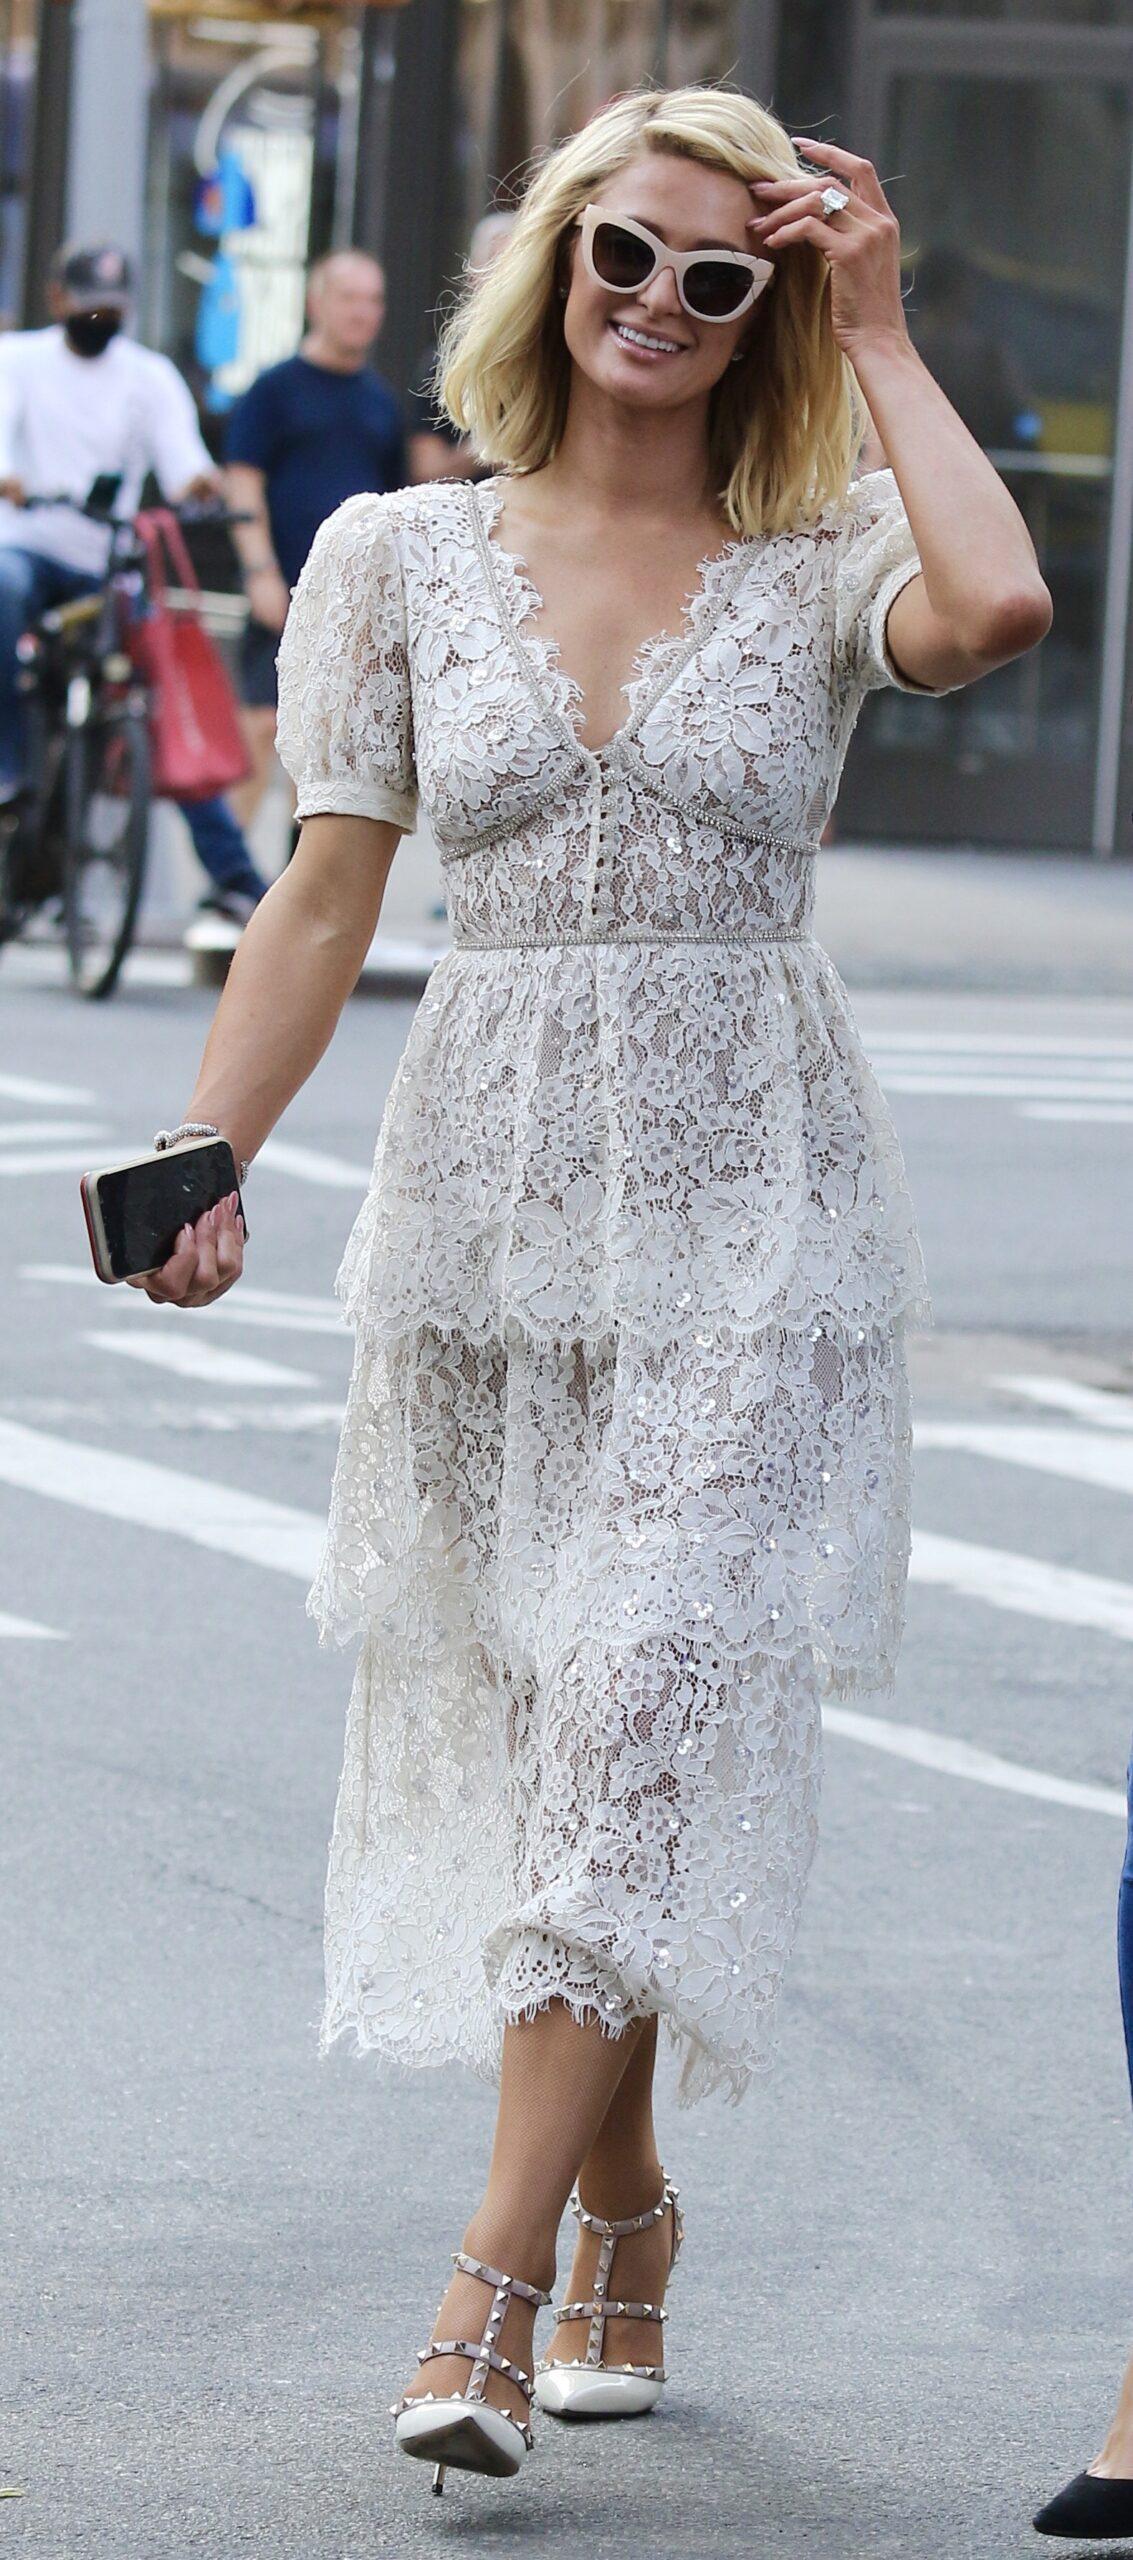 Paris Hilton in NYC.